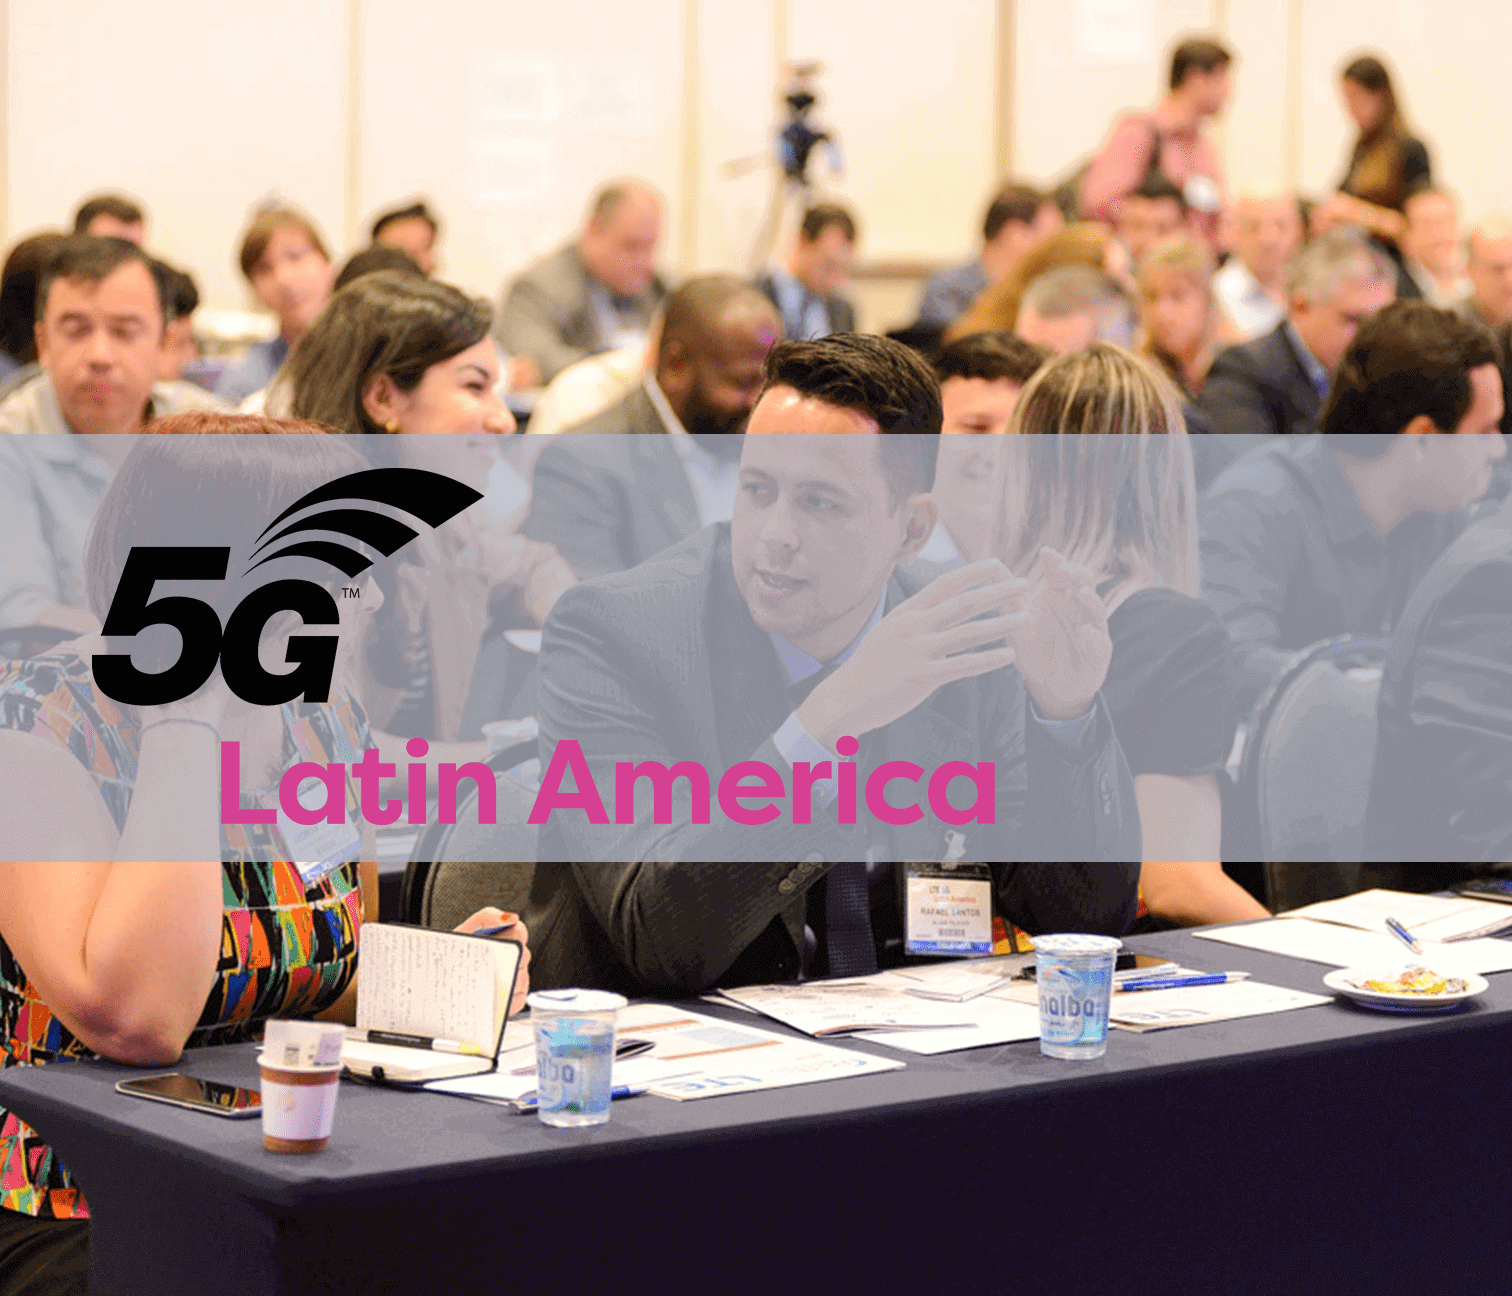 5G Latin America